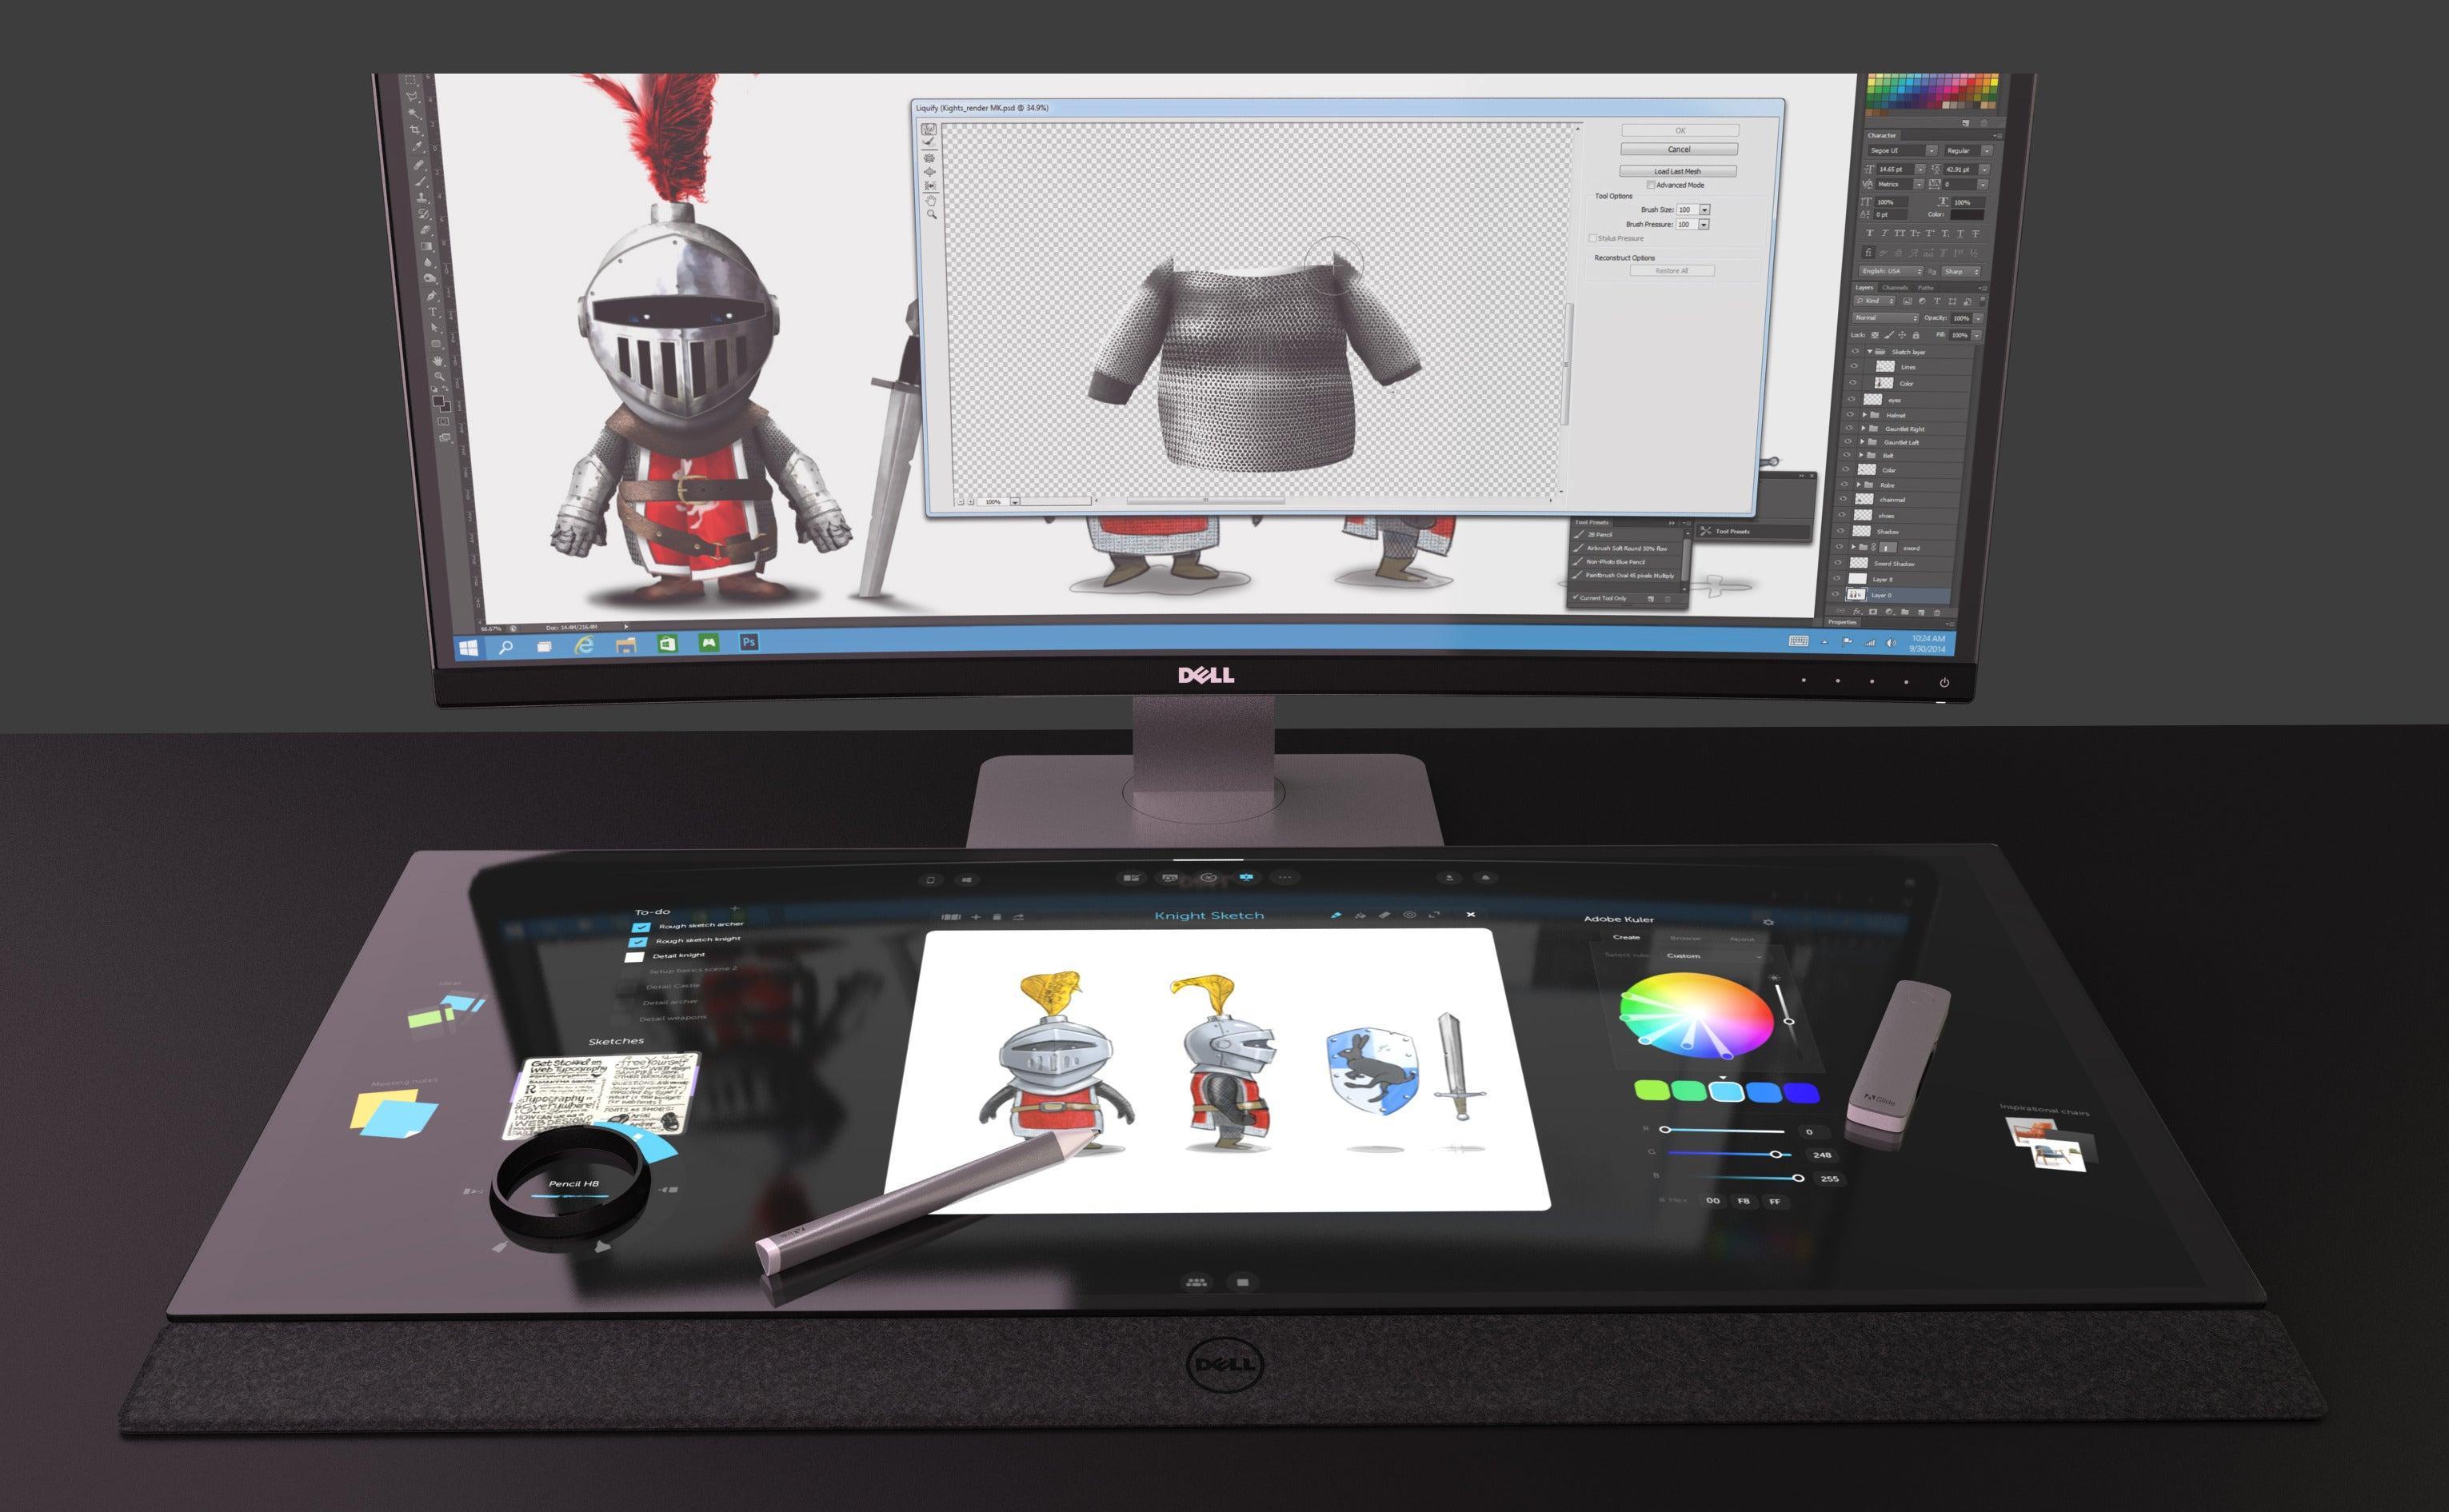 design series smart compressor music studiodesk commander desk